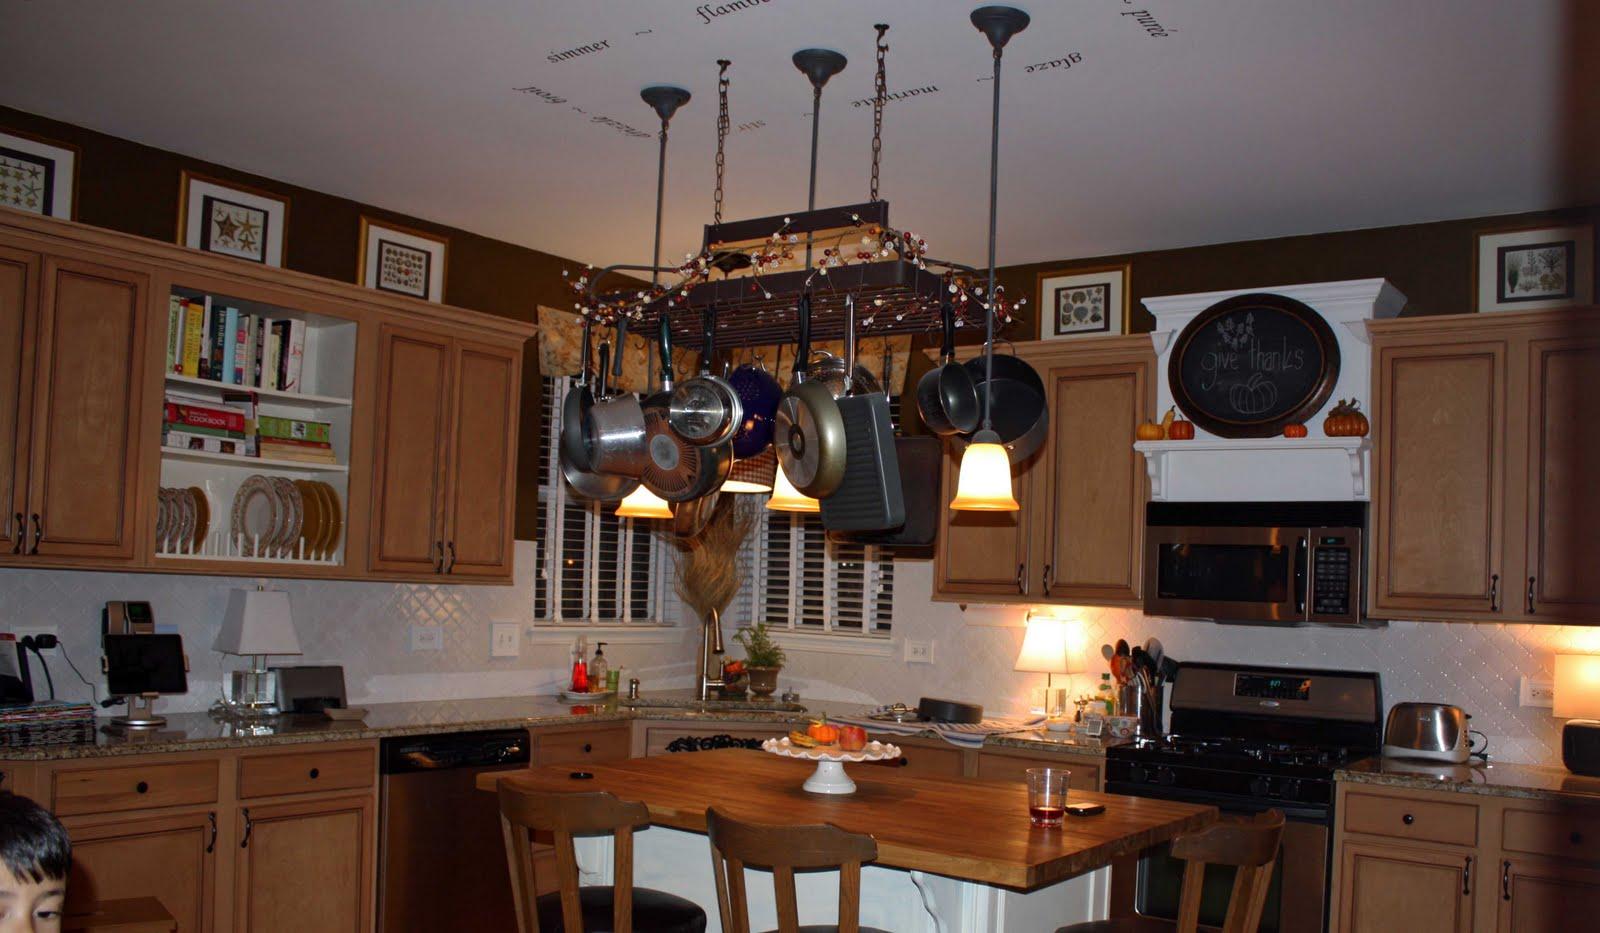 ideas kitchen cabinets utilizing space pots special place kitchen diy kitchen